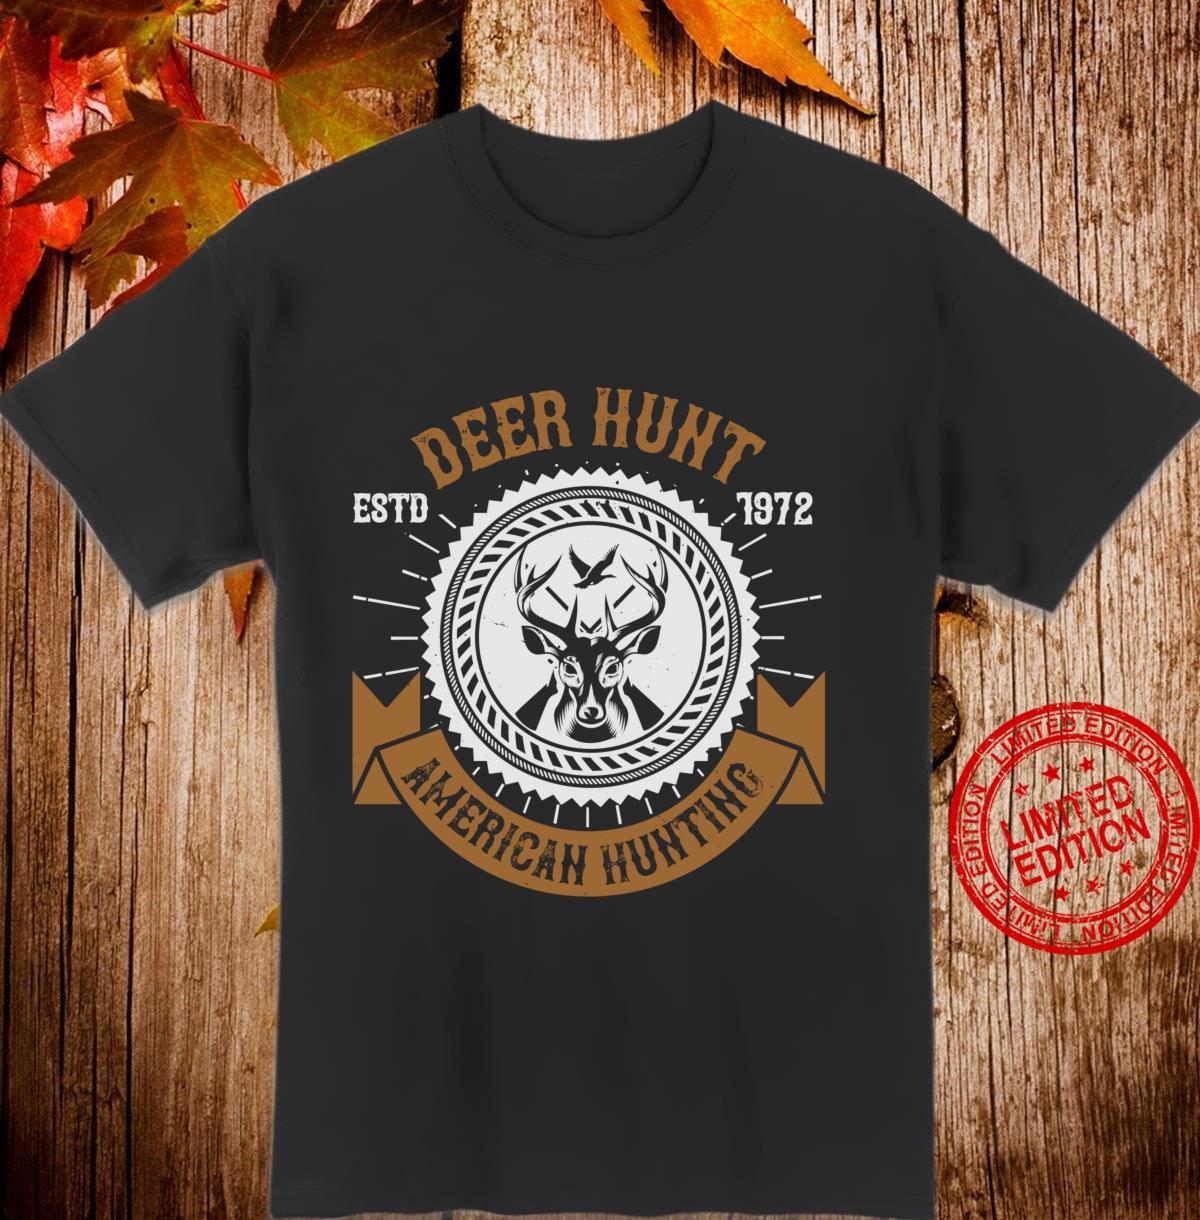 Deer Hunt American Hunting Club Shirt